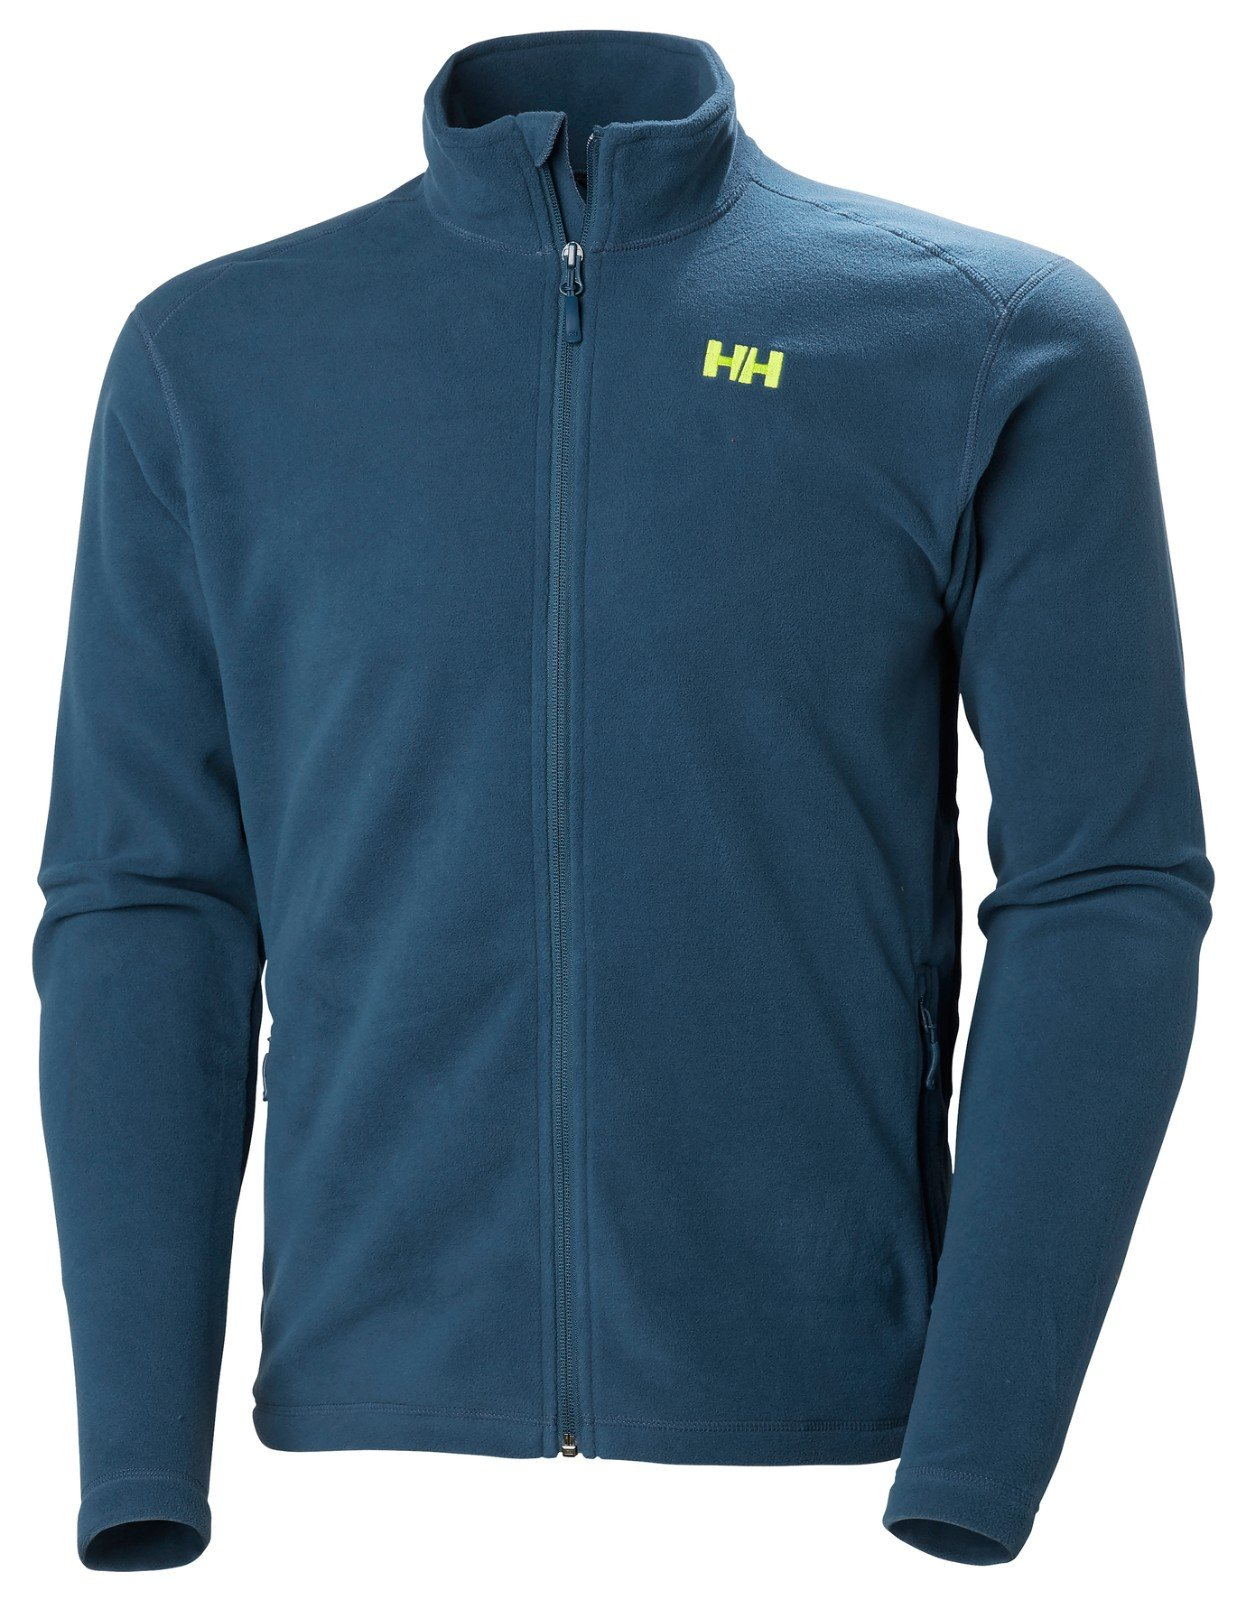 Helly Hansen Men's Daybreaker Lightweight Full Zip Fleece Jacket, 504 Dark Teal, Large by Helly Hansen